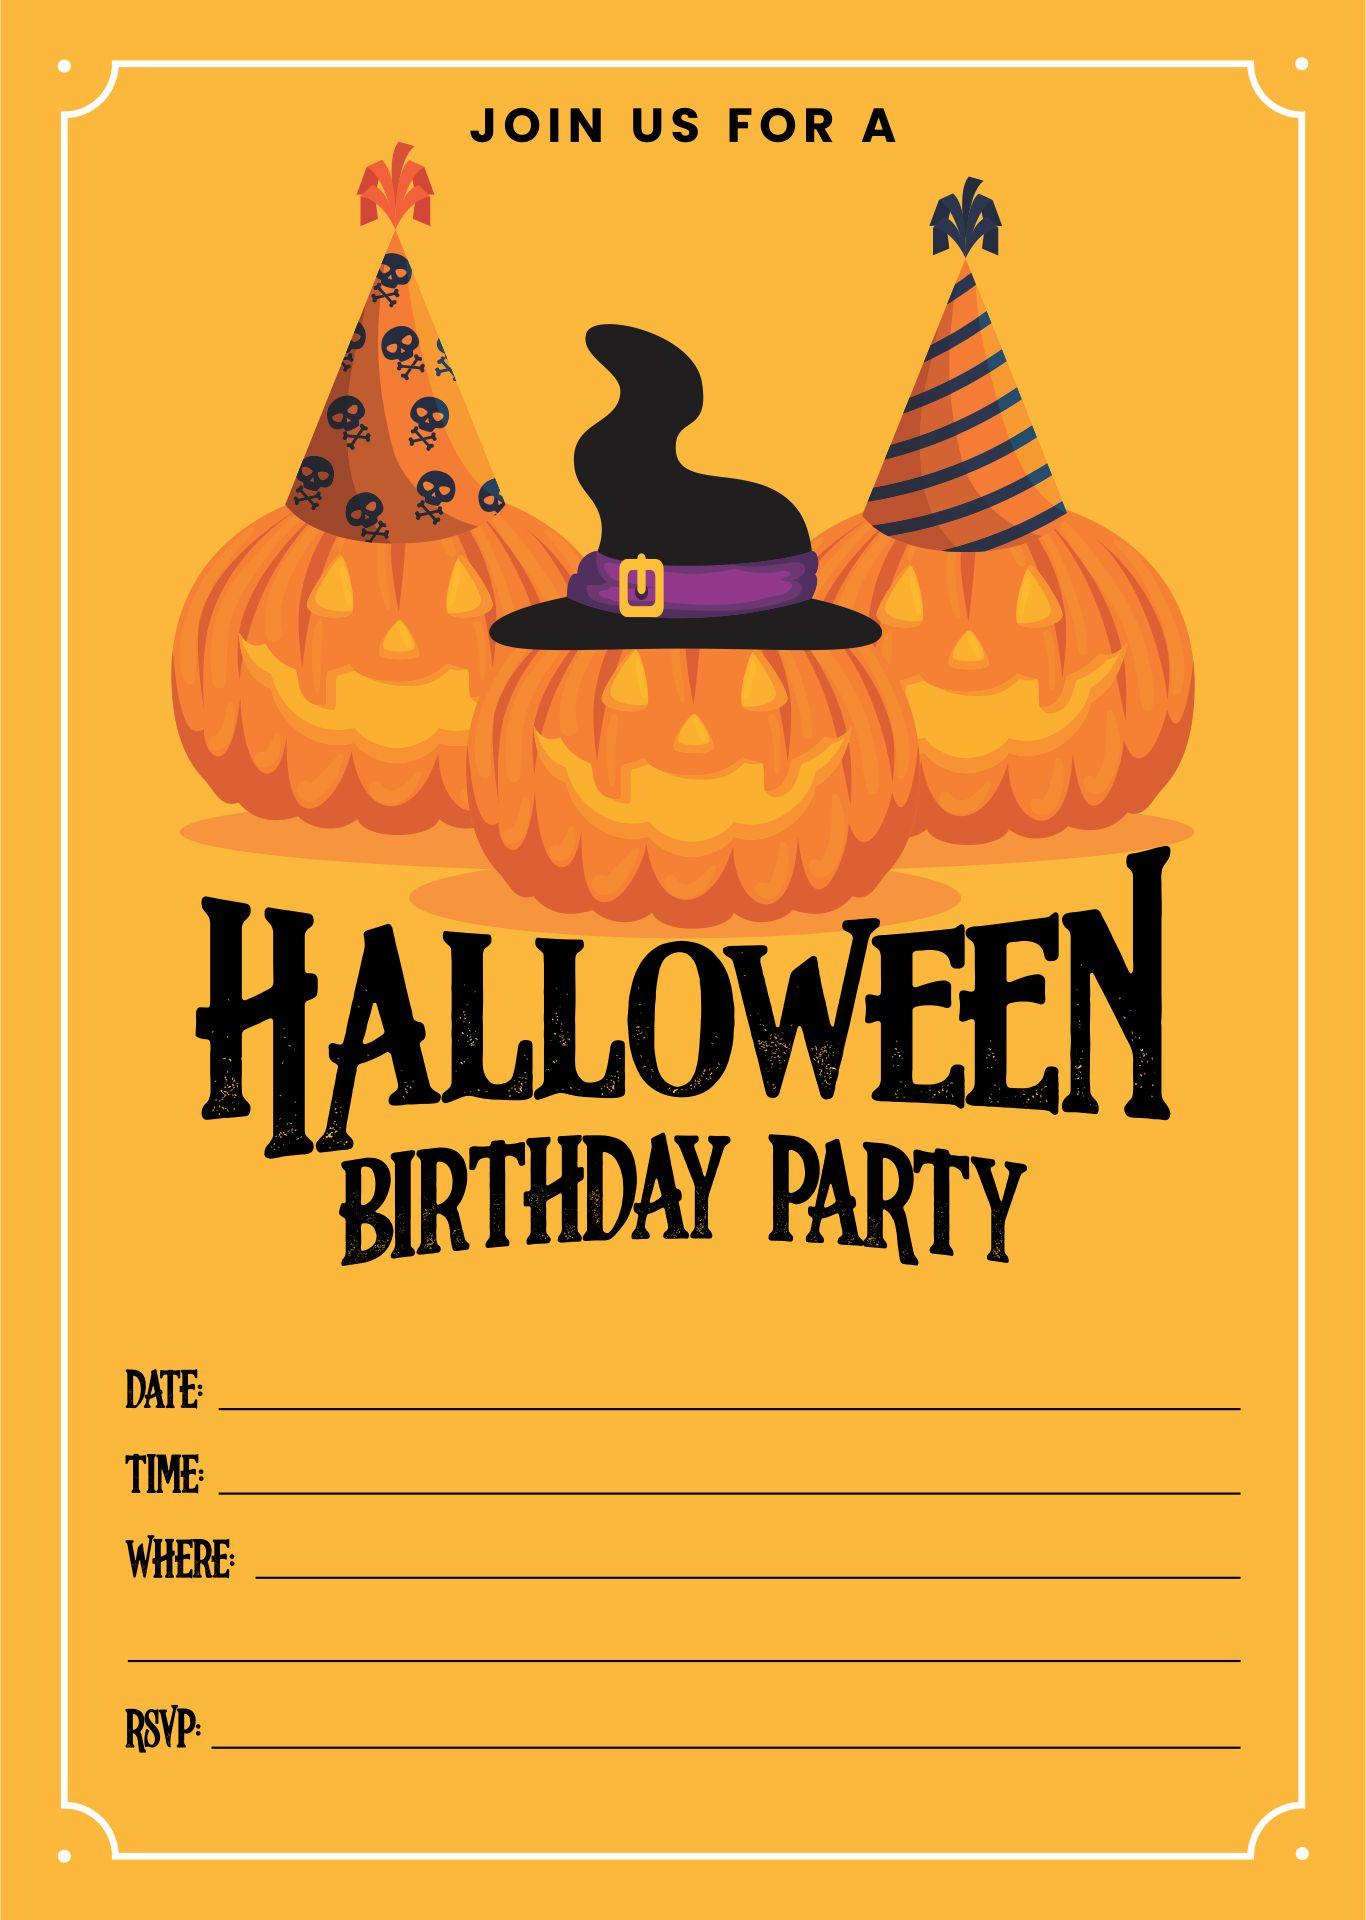 Halloween Birthday Party Invitation Templates Printable